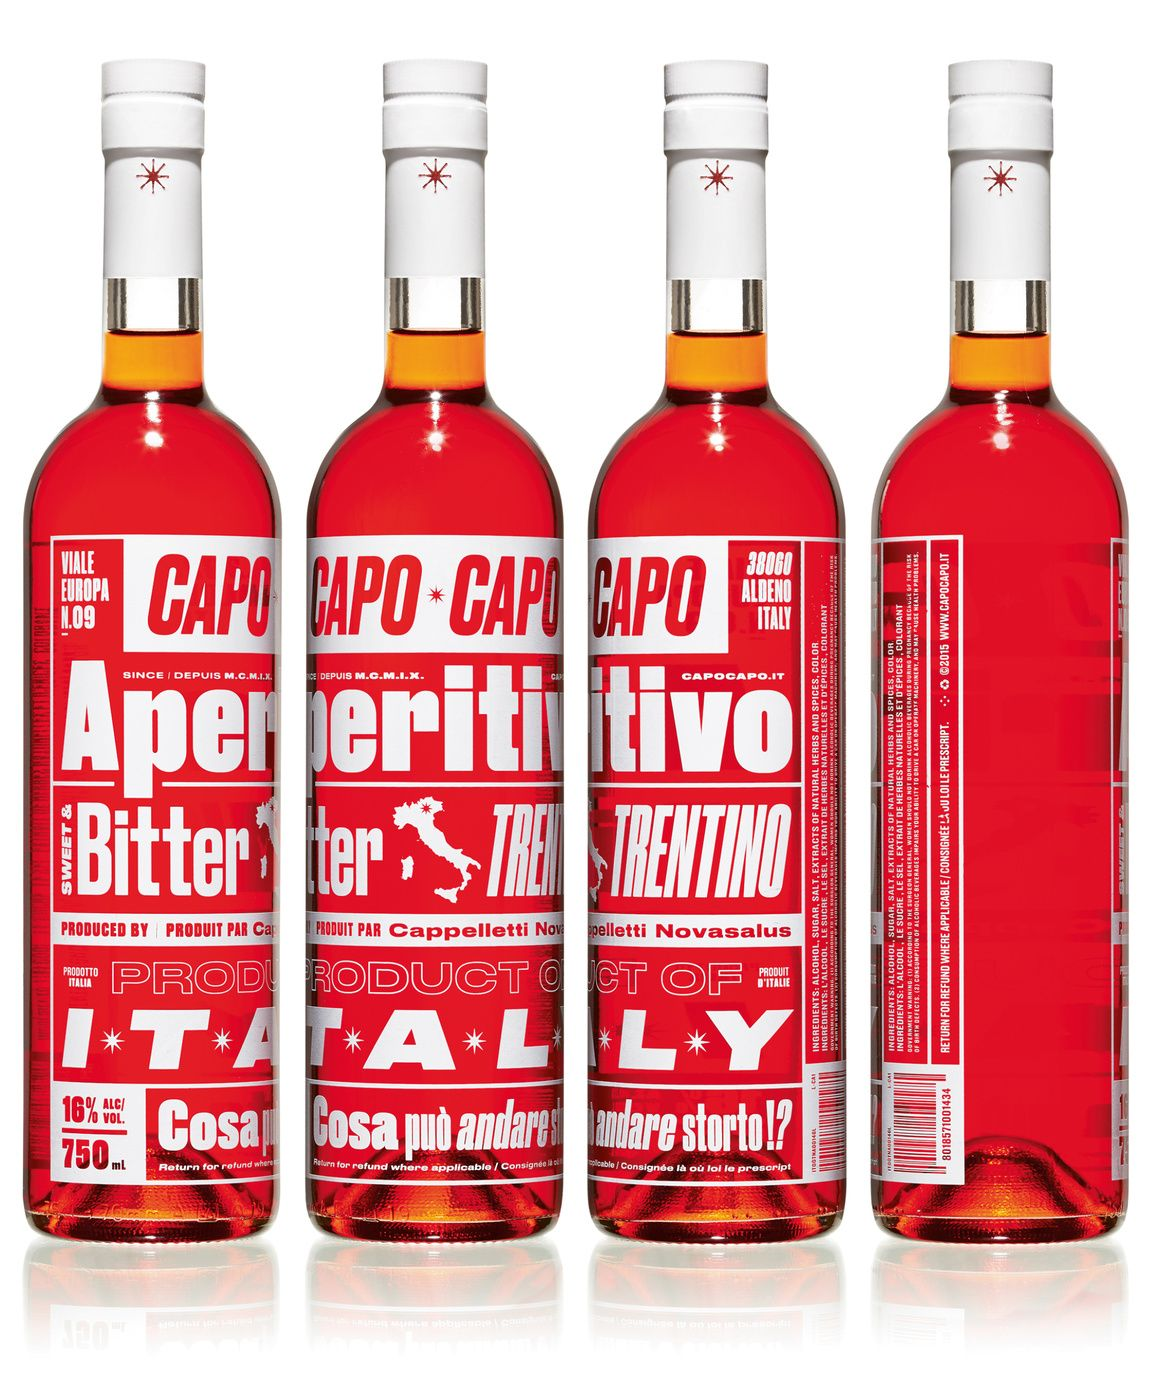 Read More Https Www Luerzersarchive Com En Magazine Print Detail Capo Capo Aperitivo 65016 Html Capo Capo Aperitivo Tags Bottle Design Bottle Vodka Bottle